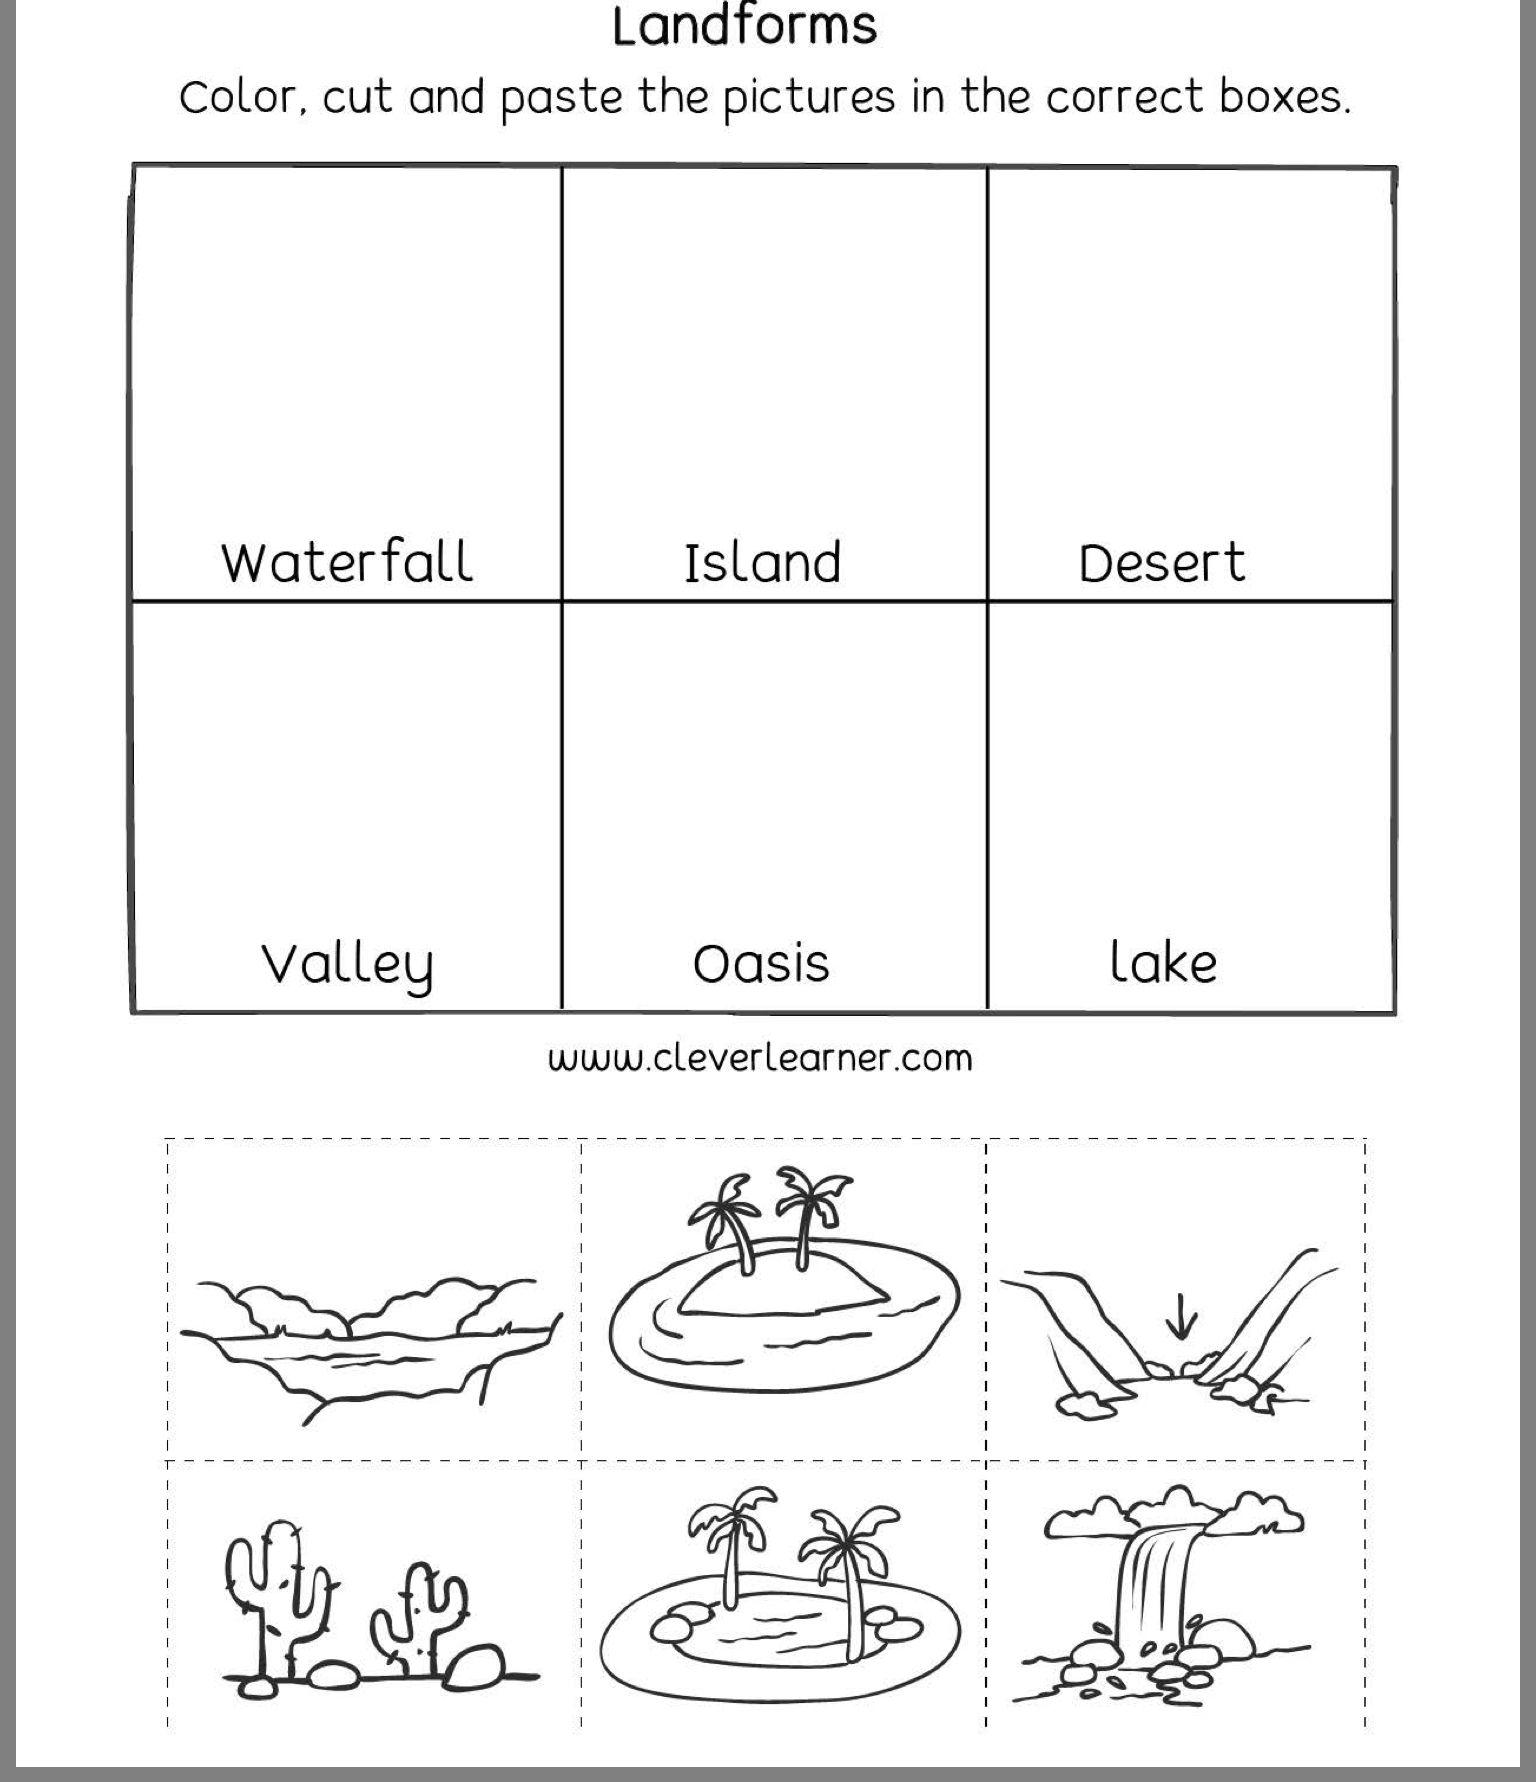 Pin By Jessica Mauras On Material Educativo Preschool Printable Worksheets Landforms